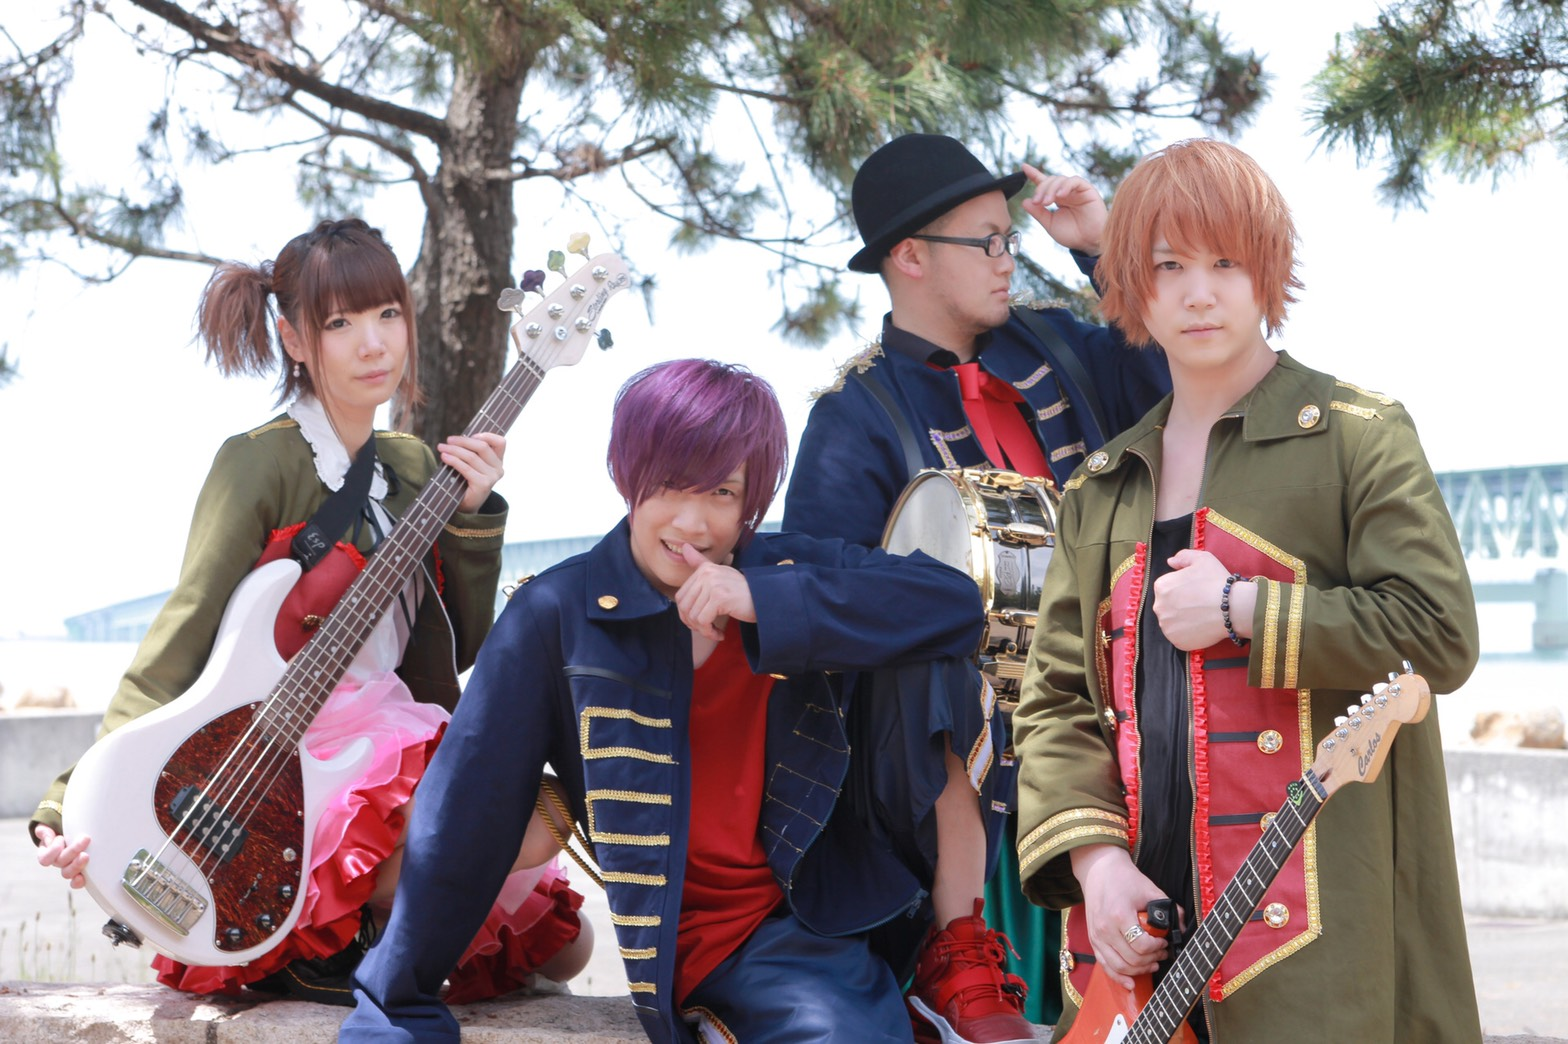 「KASHIWA State of Emergency」〜ハロウィン前夜祭 仮装してきたらドリンク代無料〜